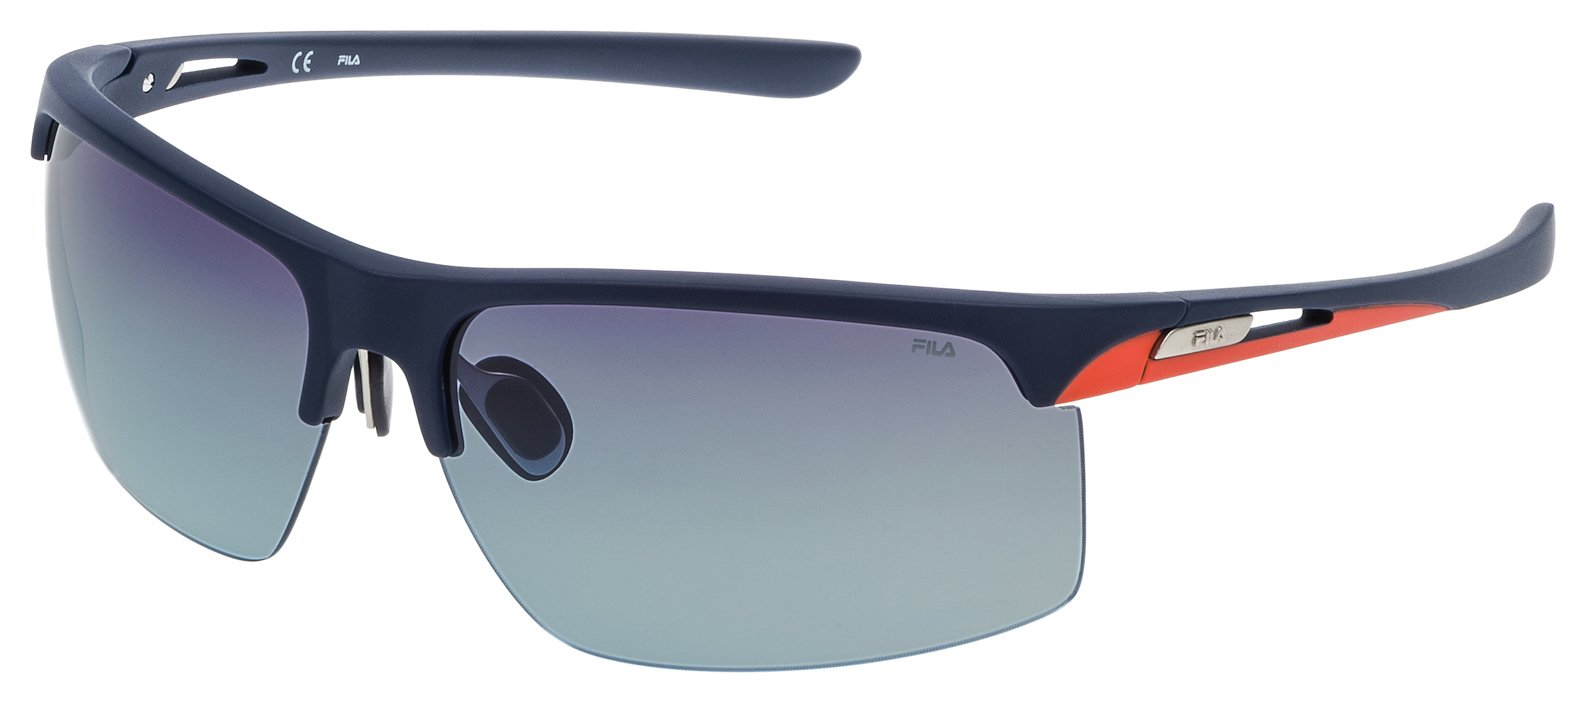 Image of Fila Gun Light Grey Lens Sunglasses.